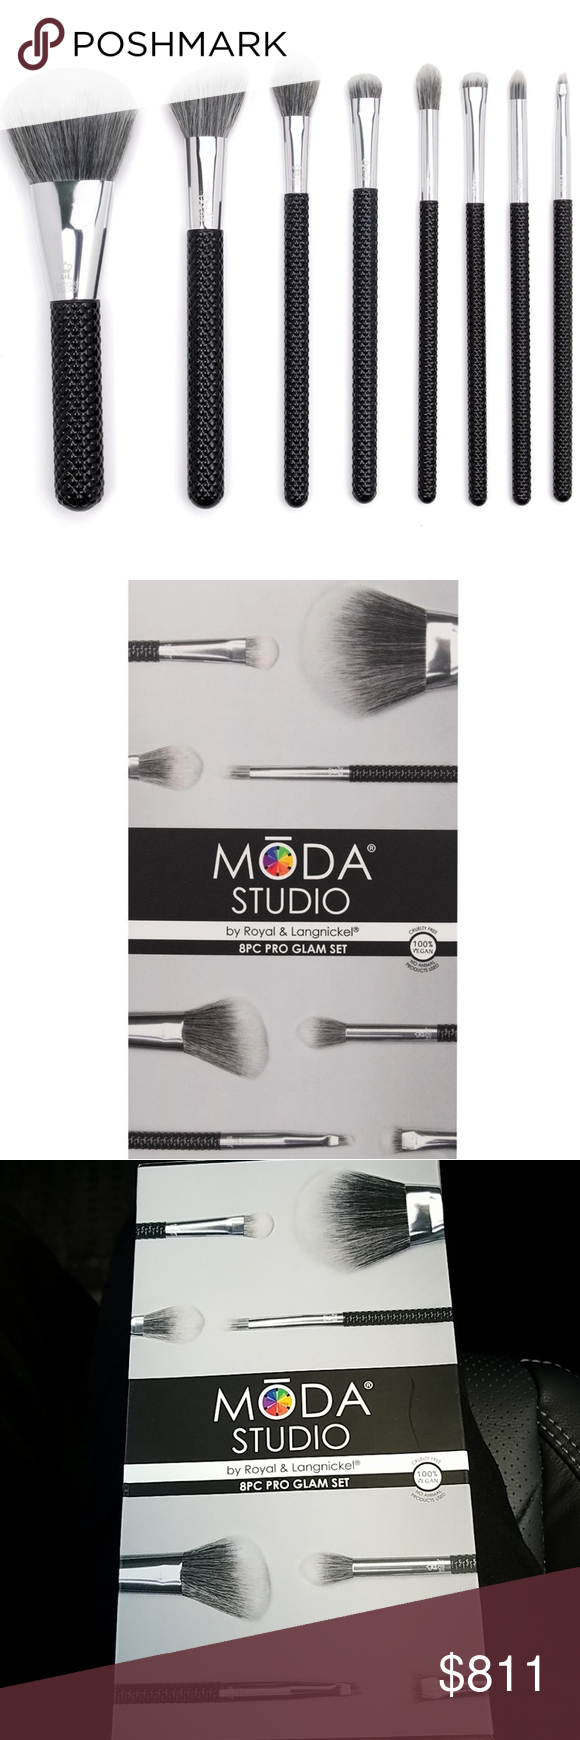 Moda studio 8 piece pro glam makeup face brush set MŌDA